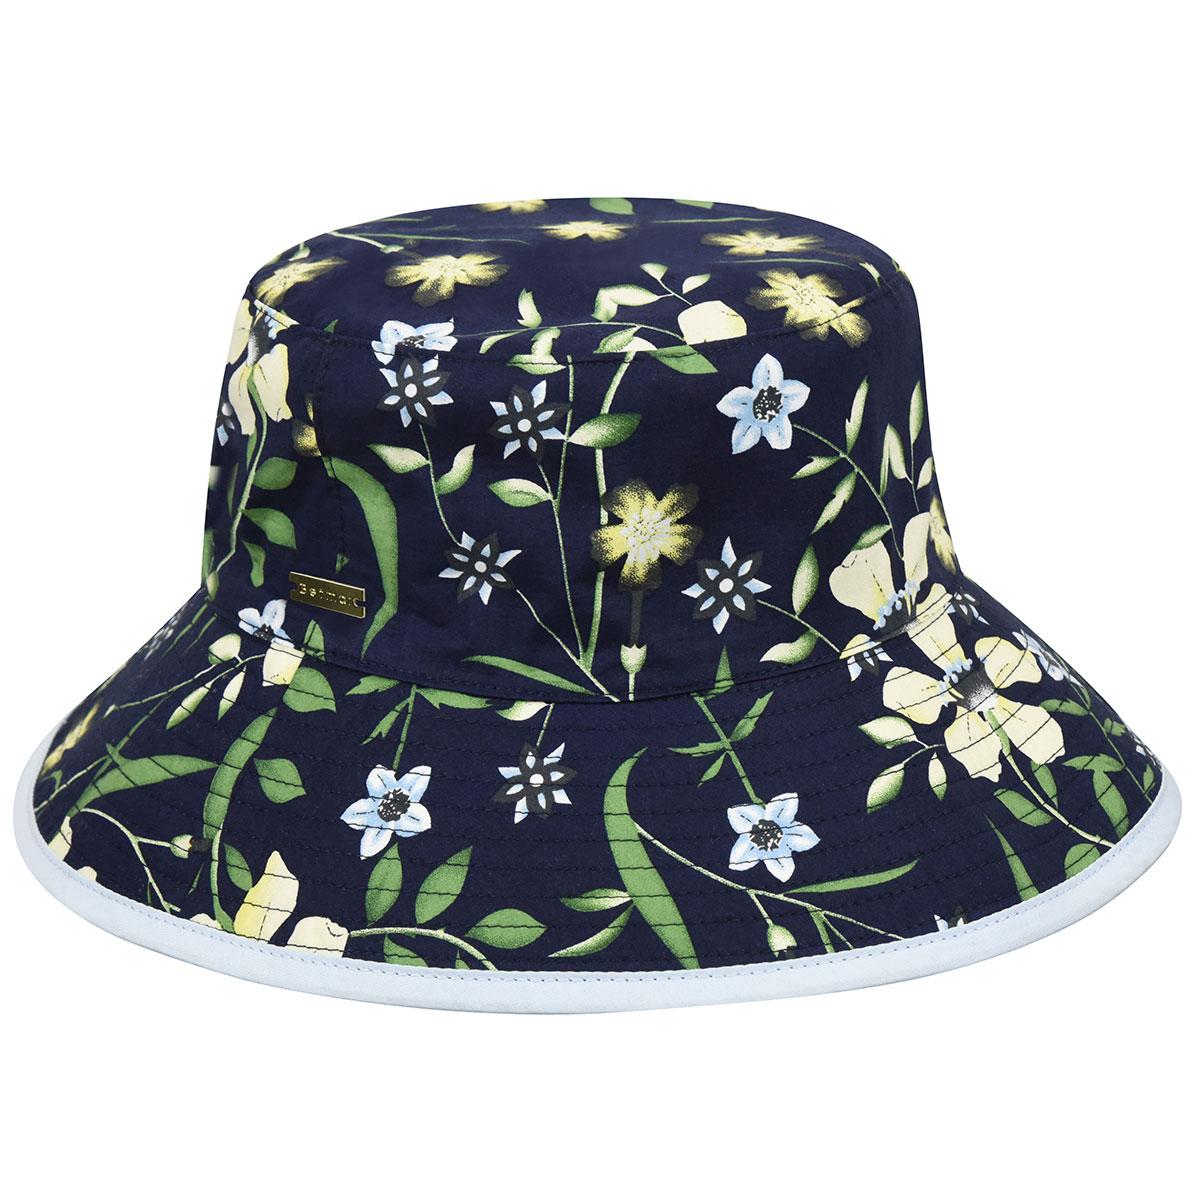 Betmar Florence Bucket in Navy,Floral